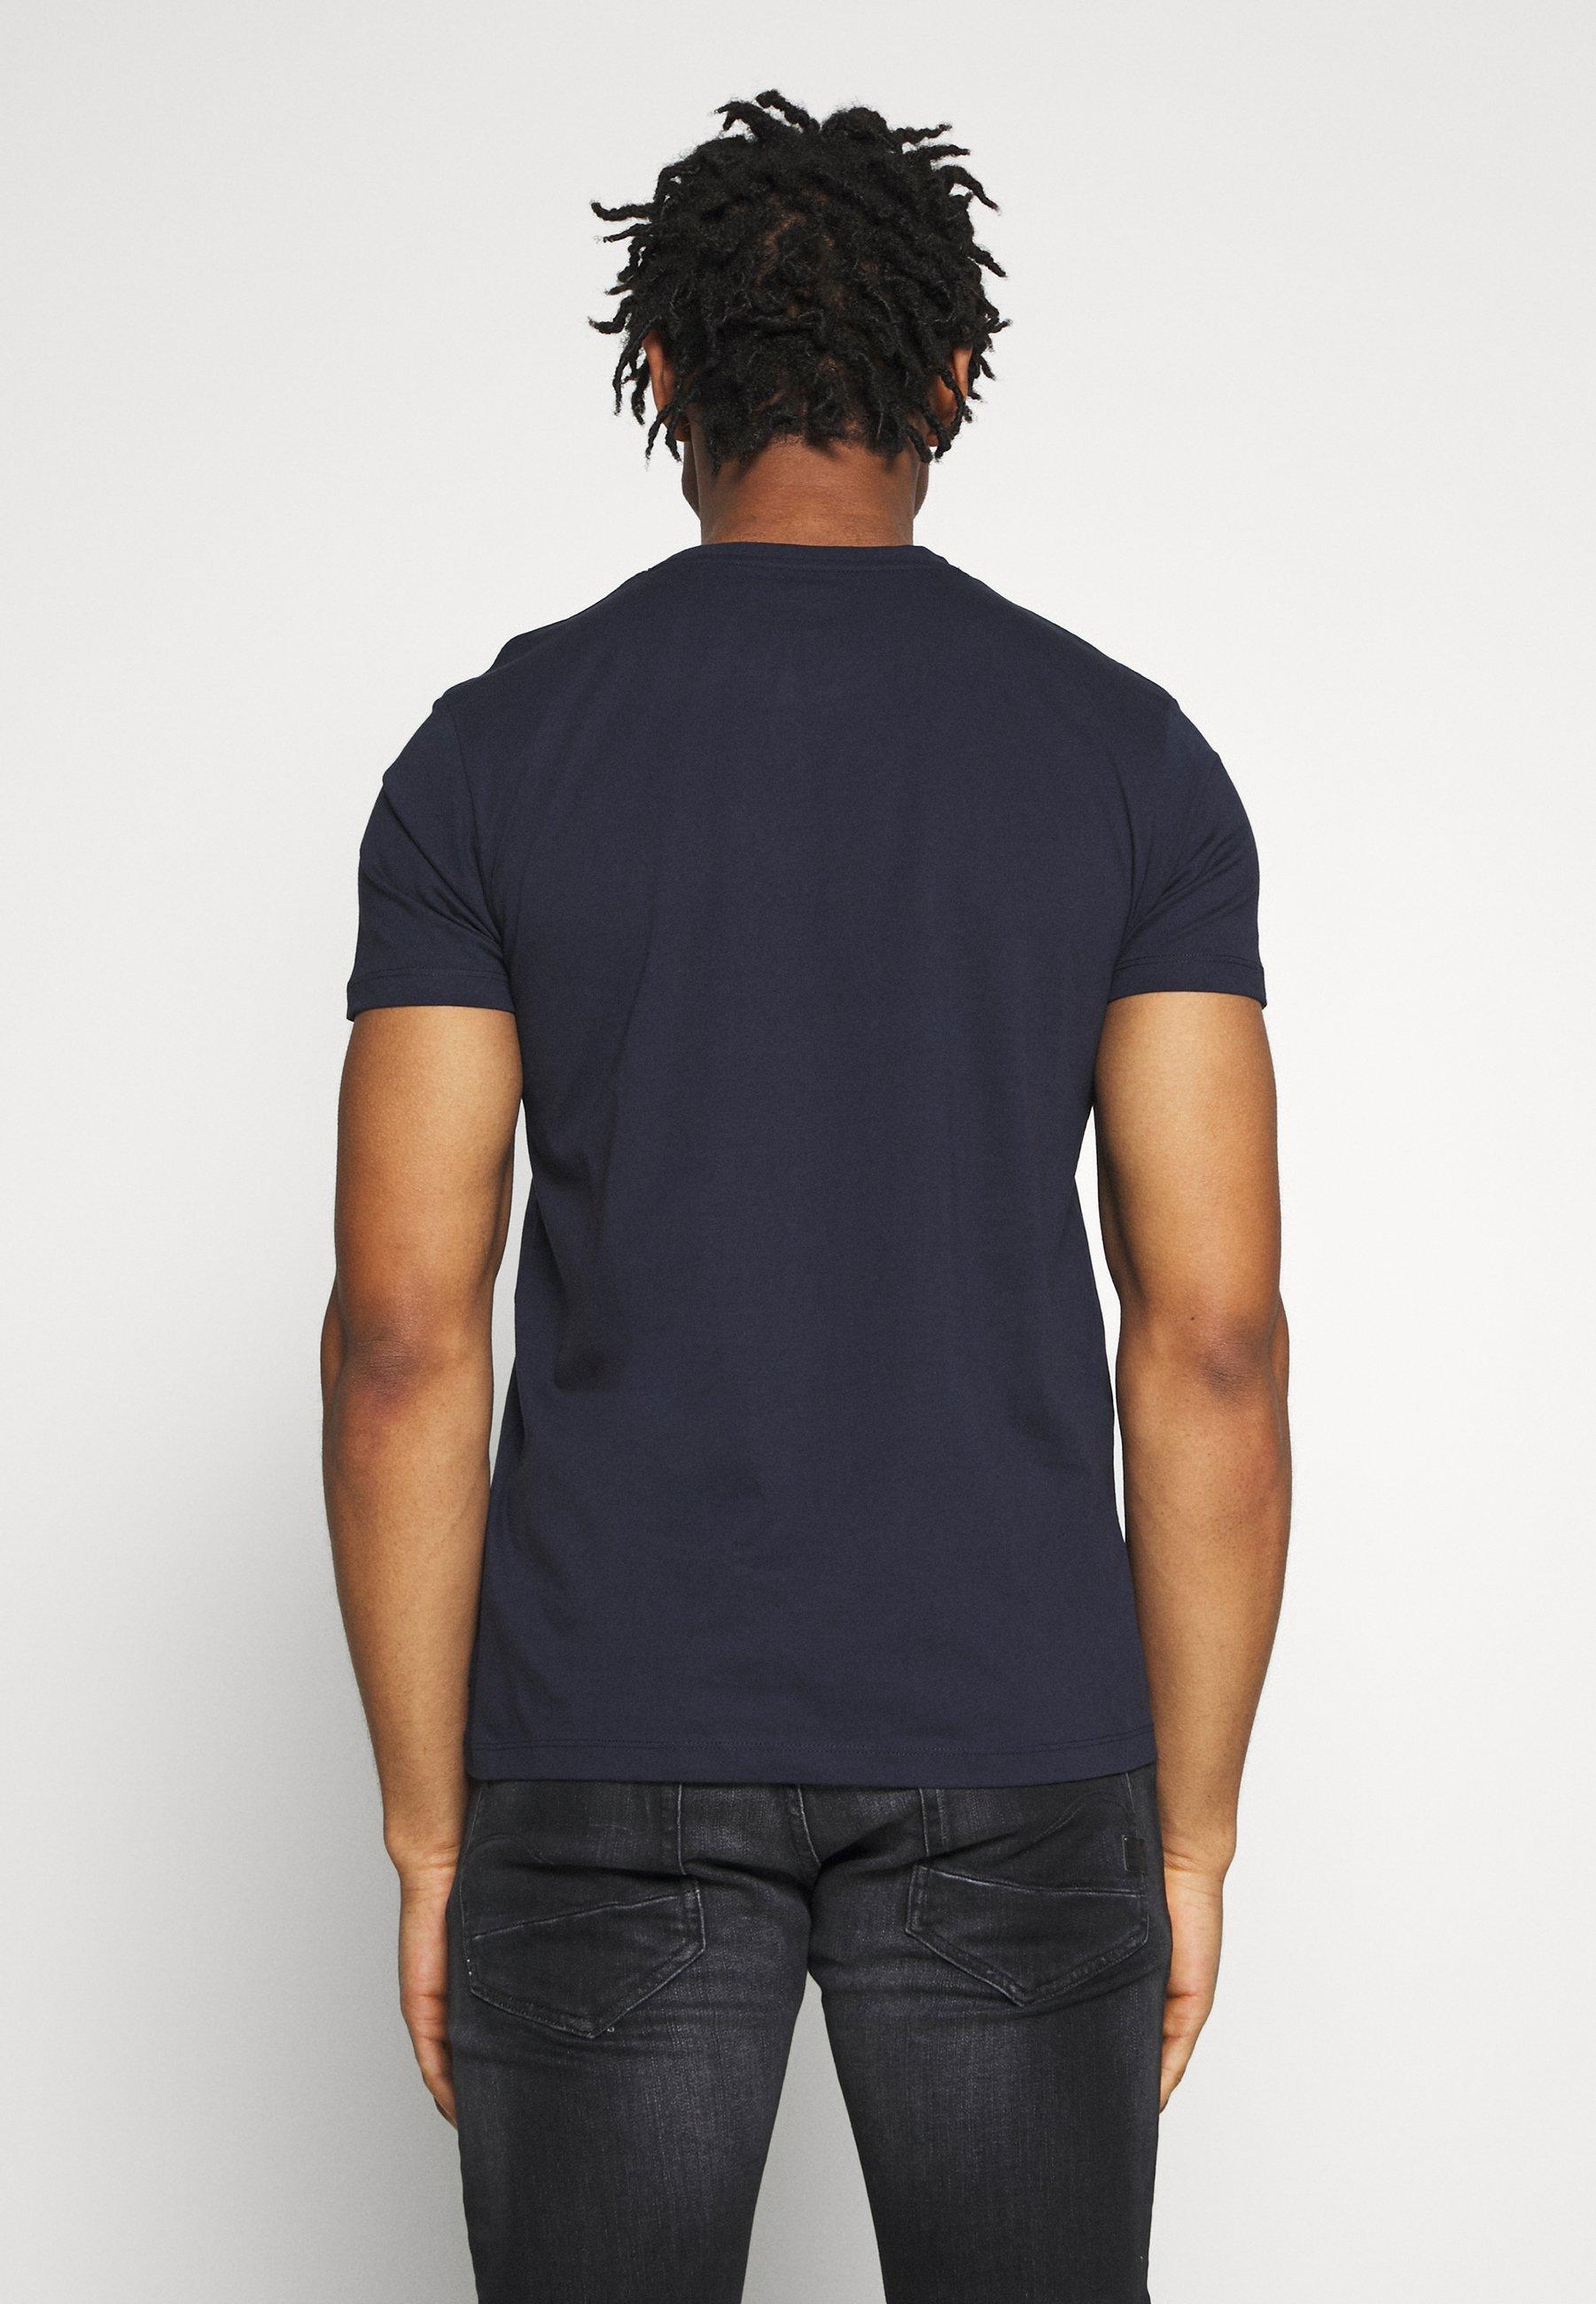 Esprit Print T-shirt - navy pajFz